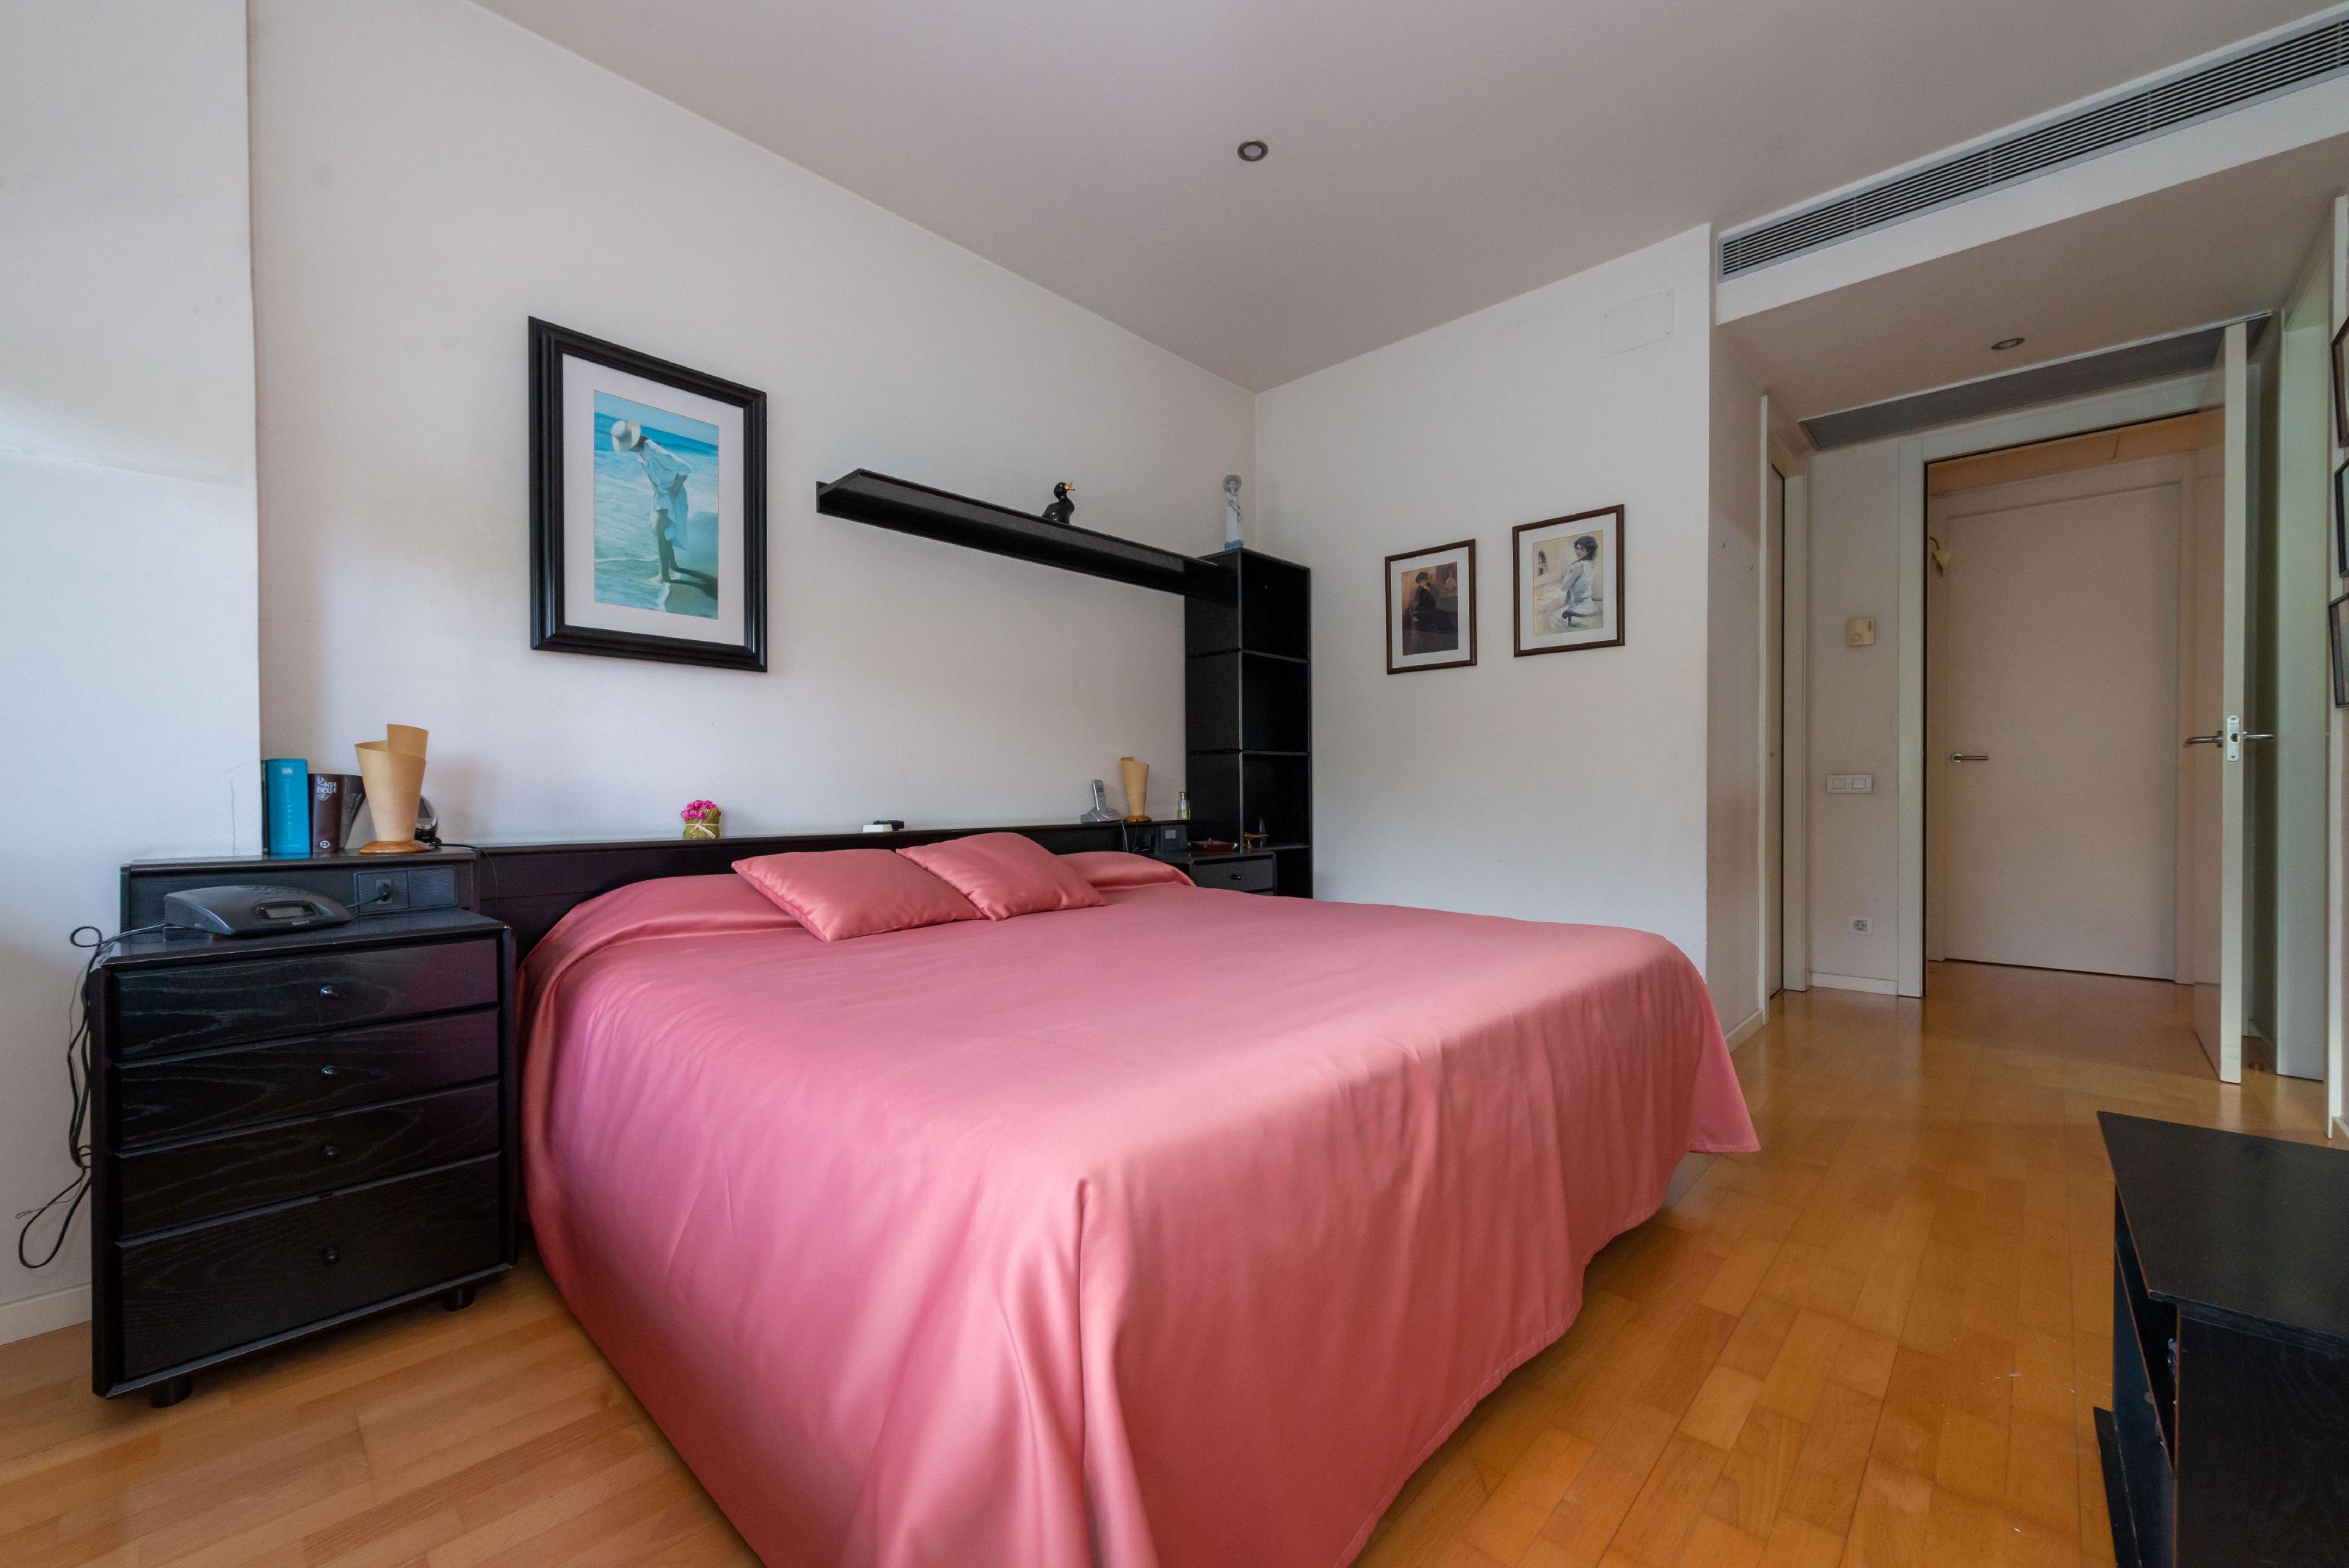 246281 Flat for sale in Sarrià-Sant Gervasi, Tres Torres 4